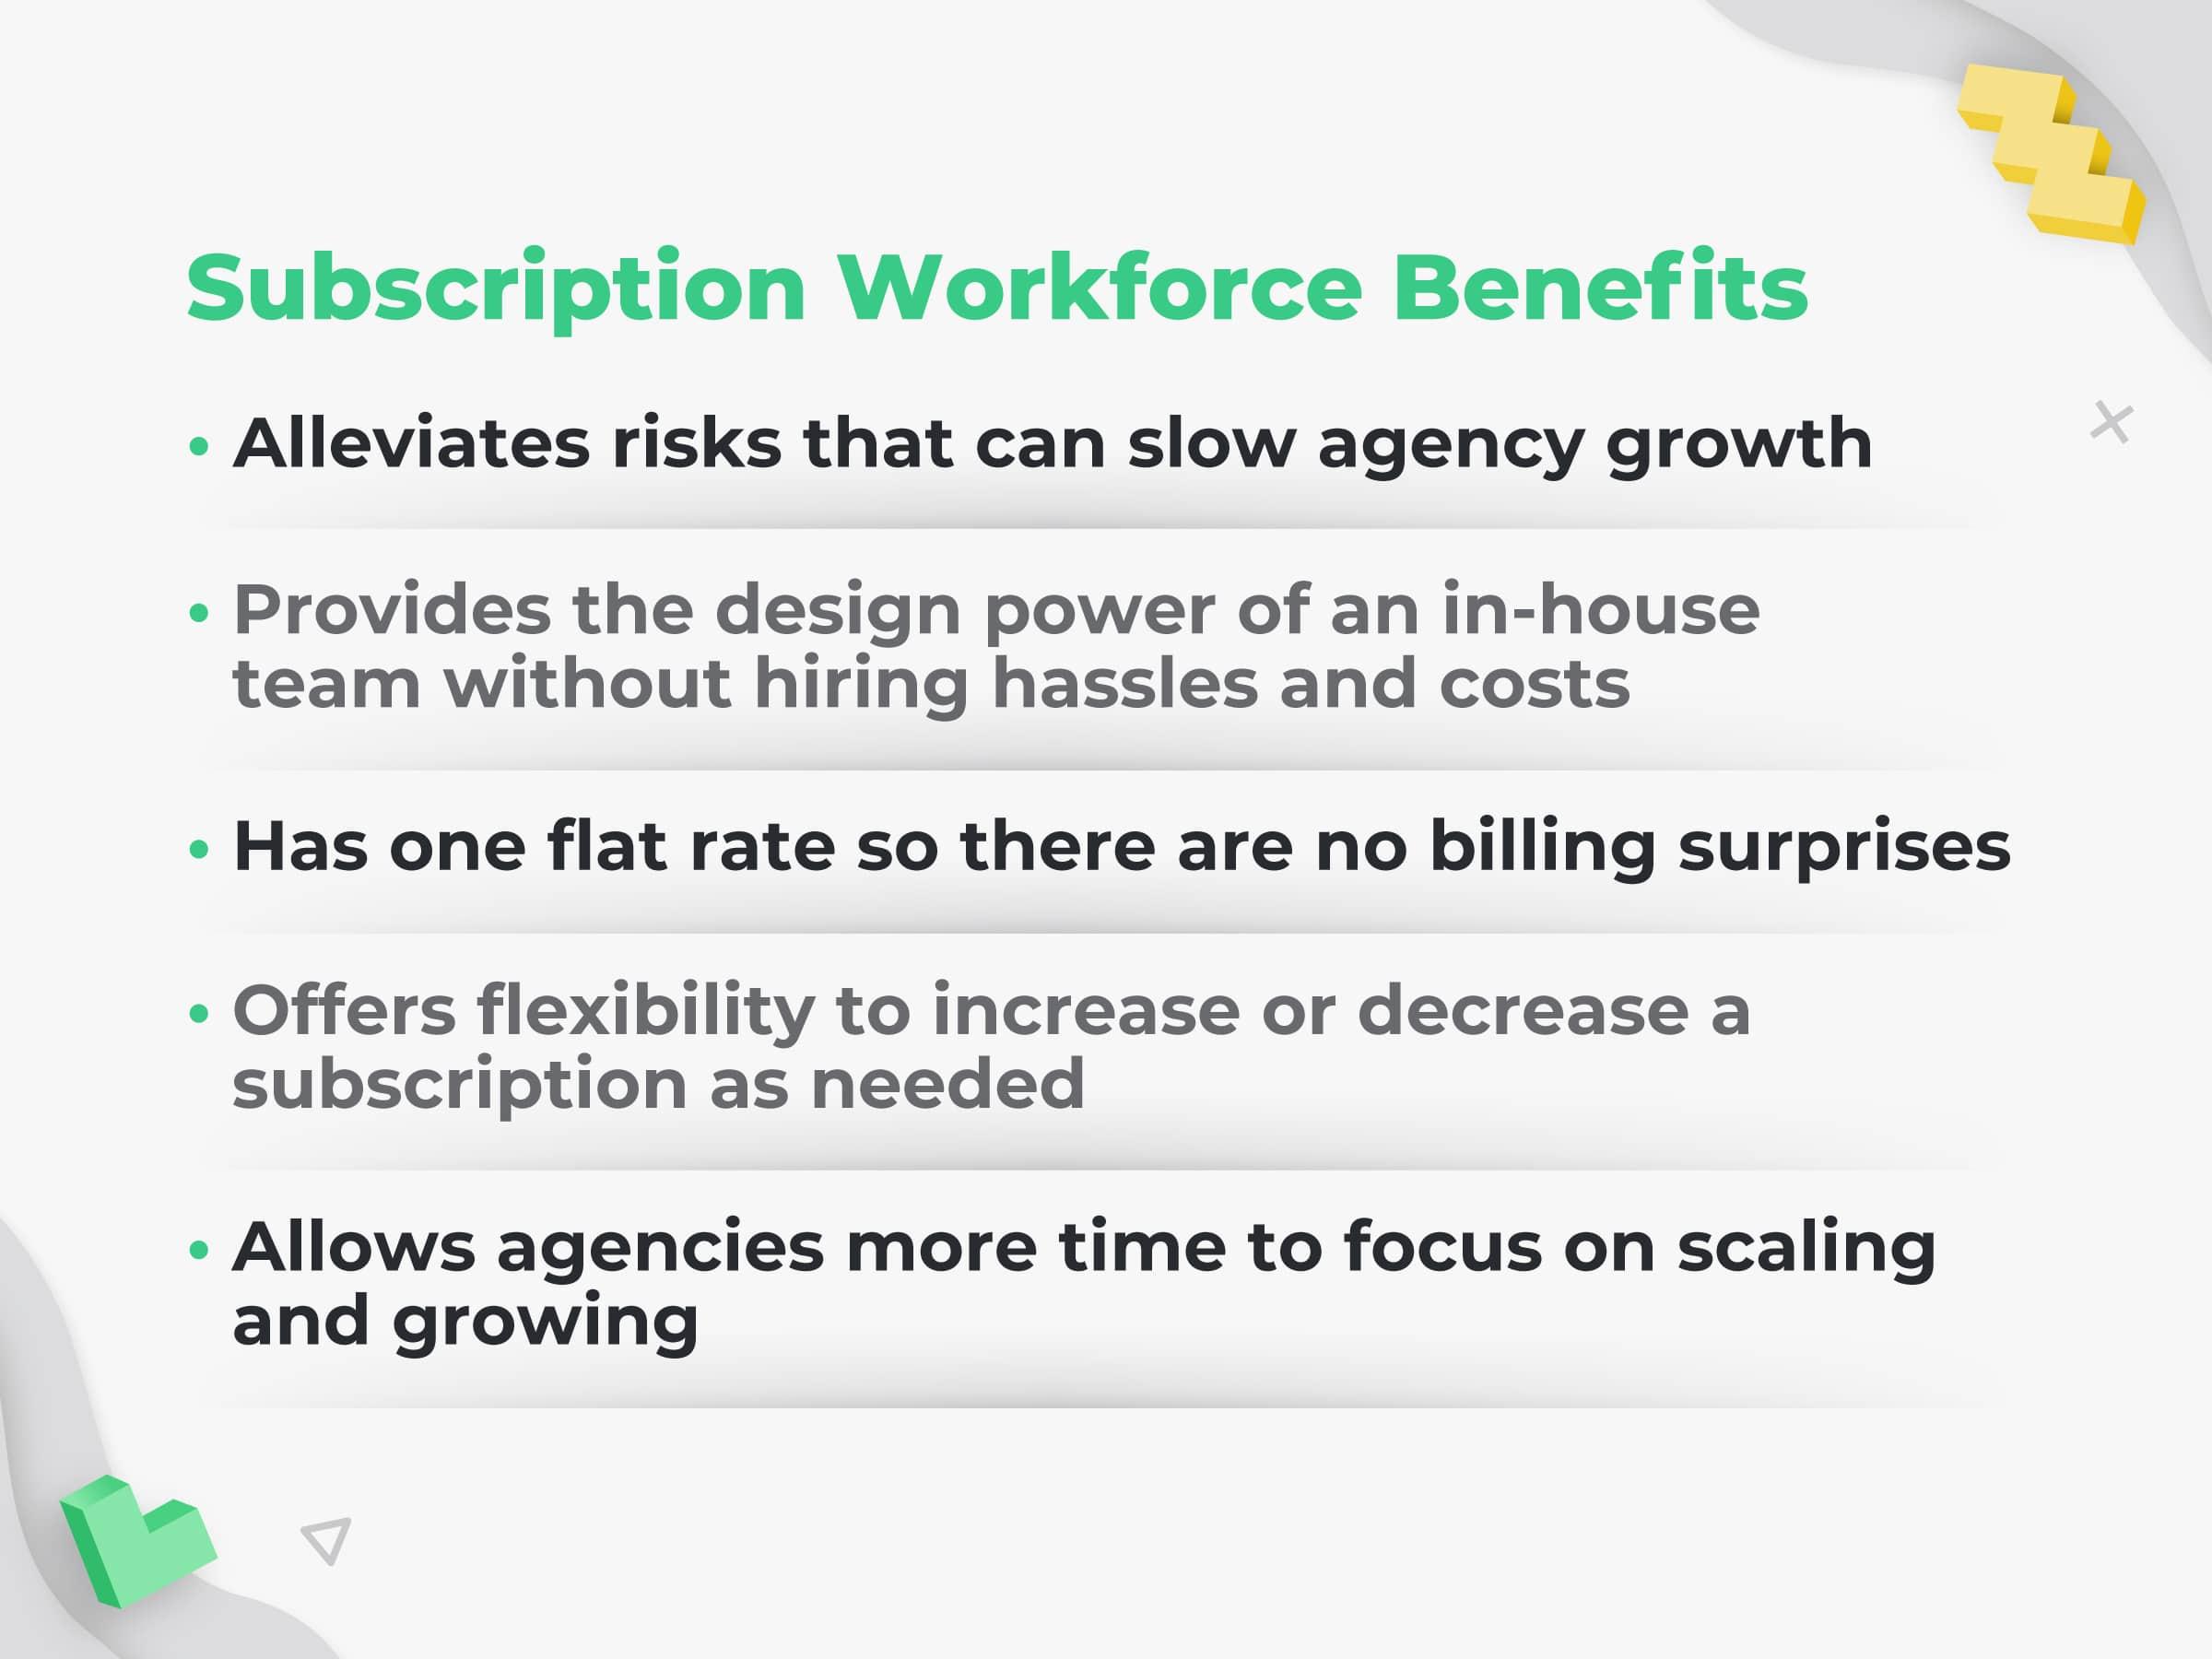 Subscription Workforce Benefits